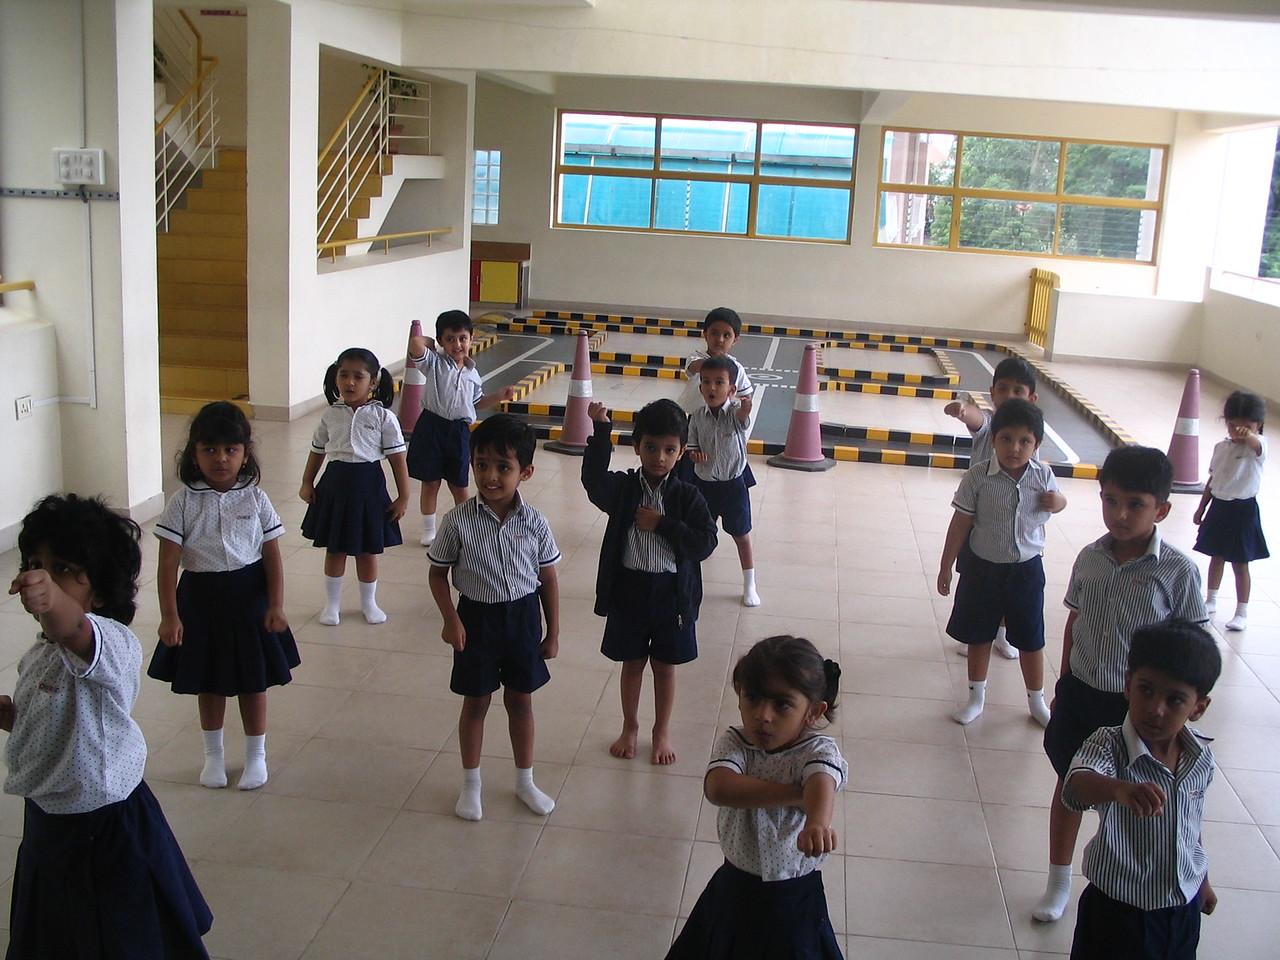 CHILDREN IN TAEKWONDO CLASS